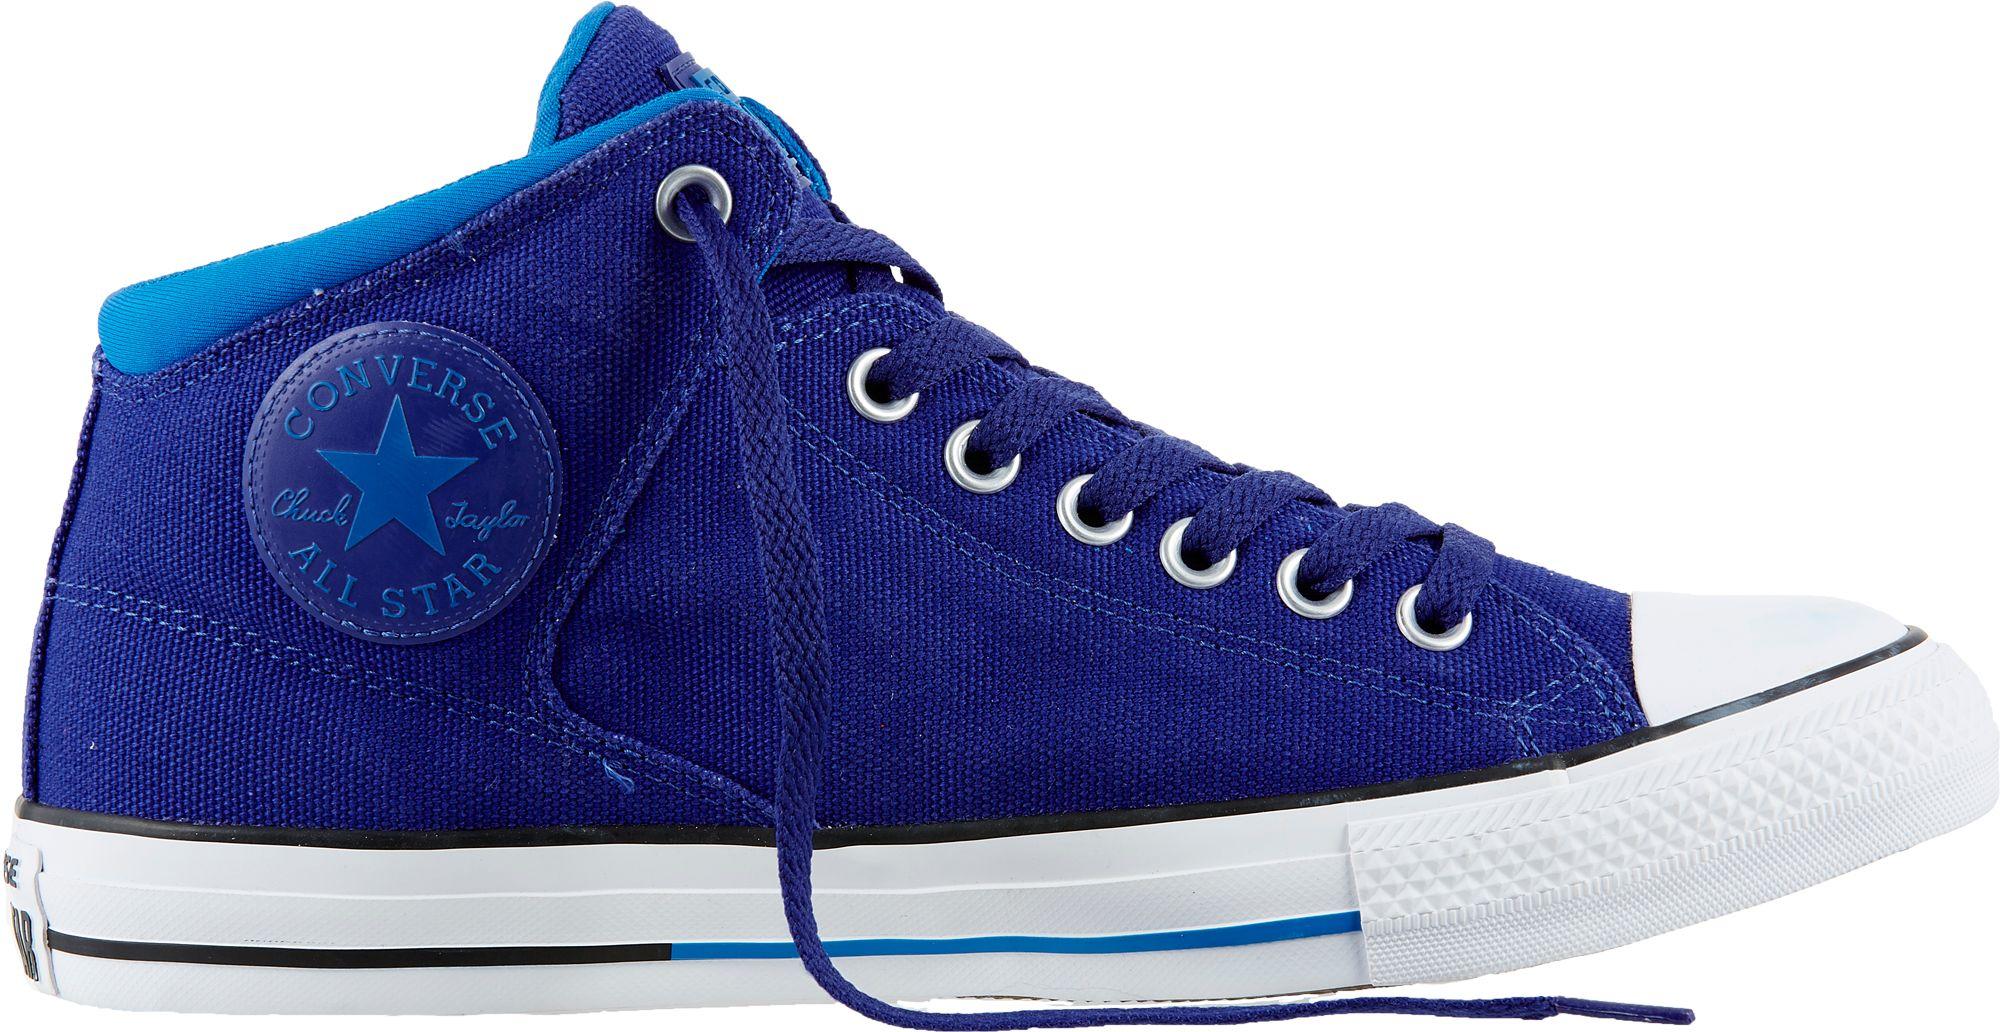 0b71ff541ab Converse Mens Chuck Taylor All Star High Street Hi Top Casual Shoes DICKS  Sporting Goods 85%OFF